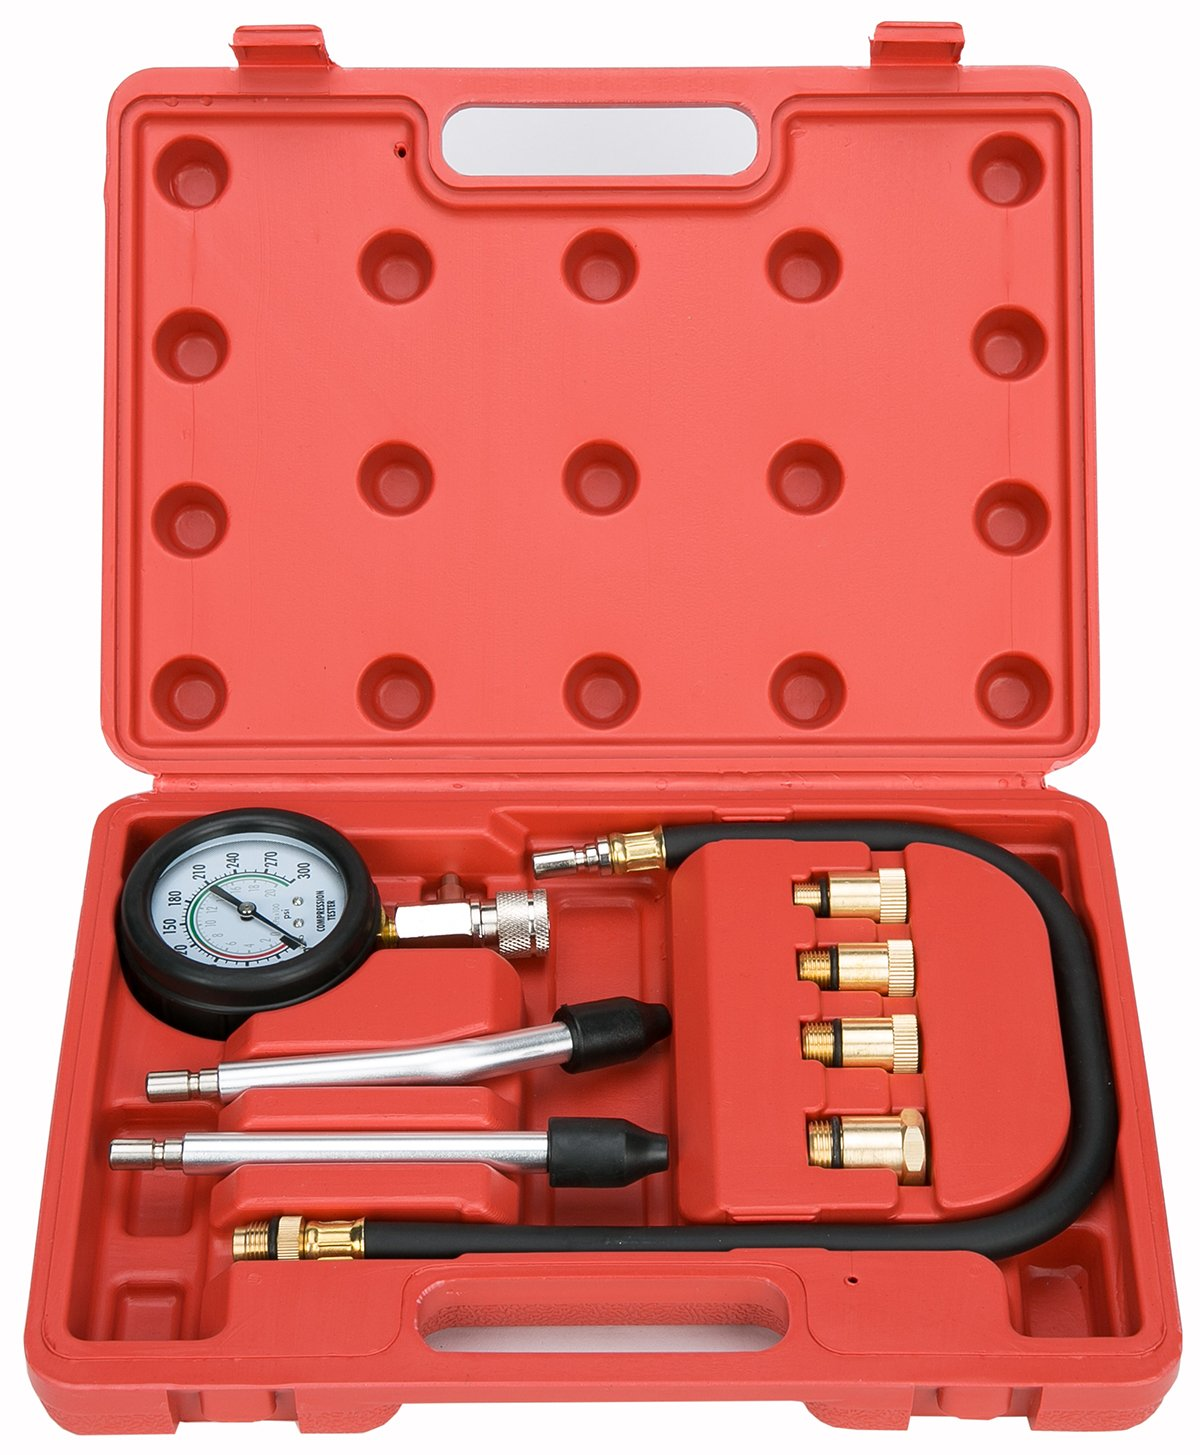 8milelake Professional Petrol Gas Engine Cylinder Compression Tester Gauge Kit Auto Tool freebirdtrading